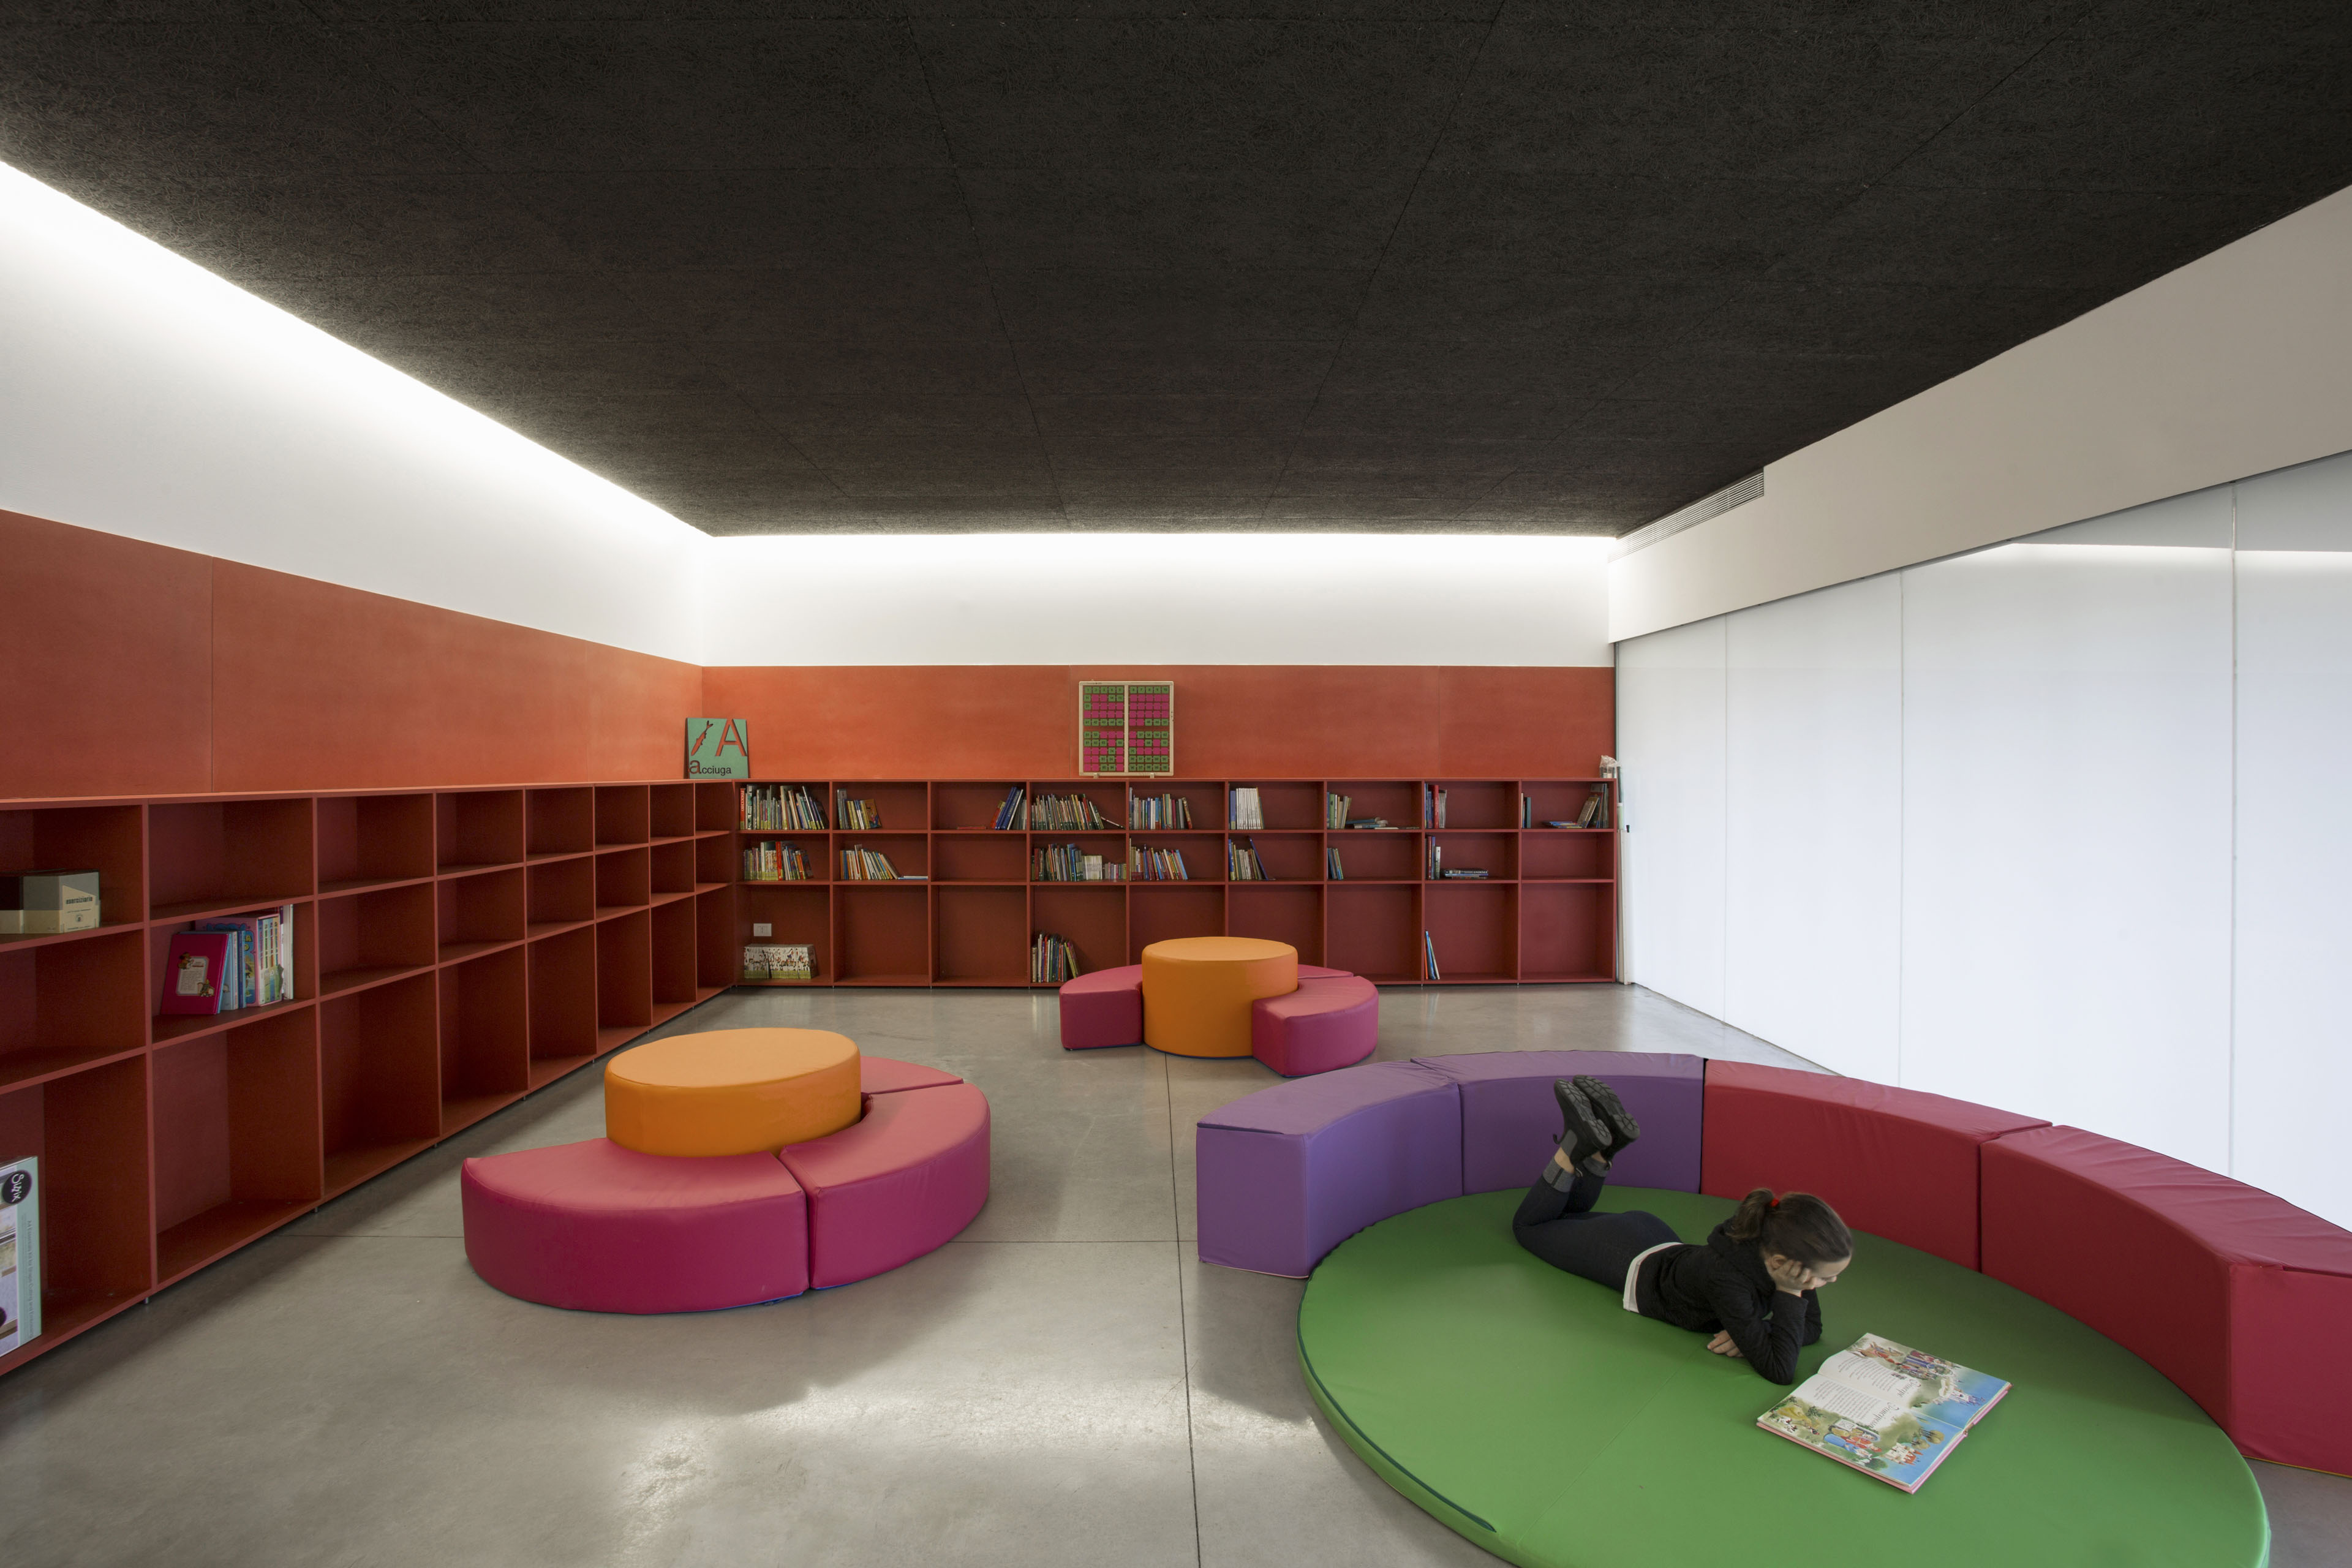 bibliot1@galeazzi